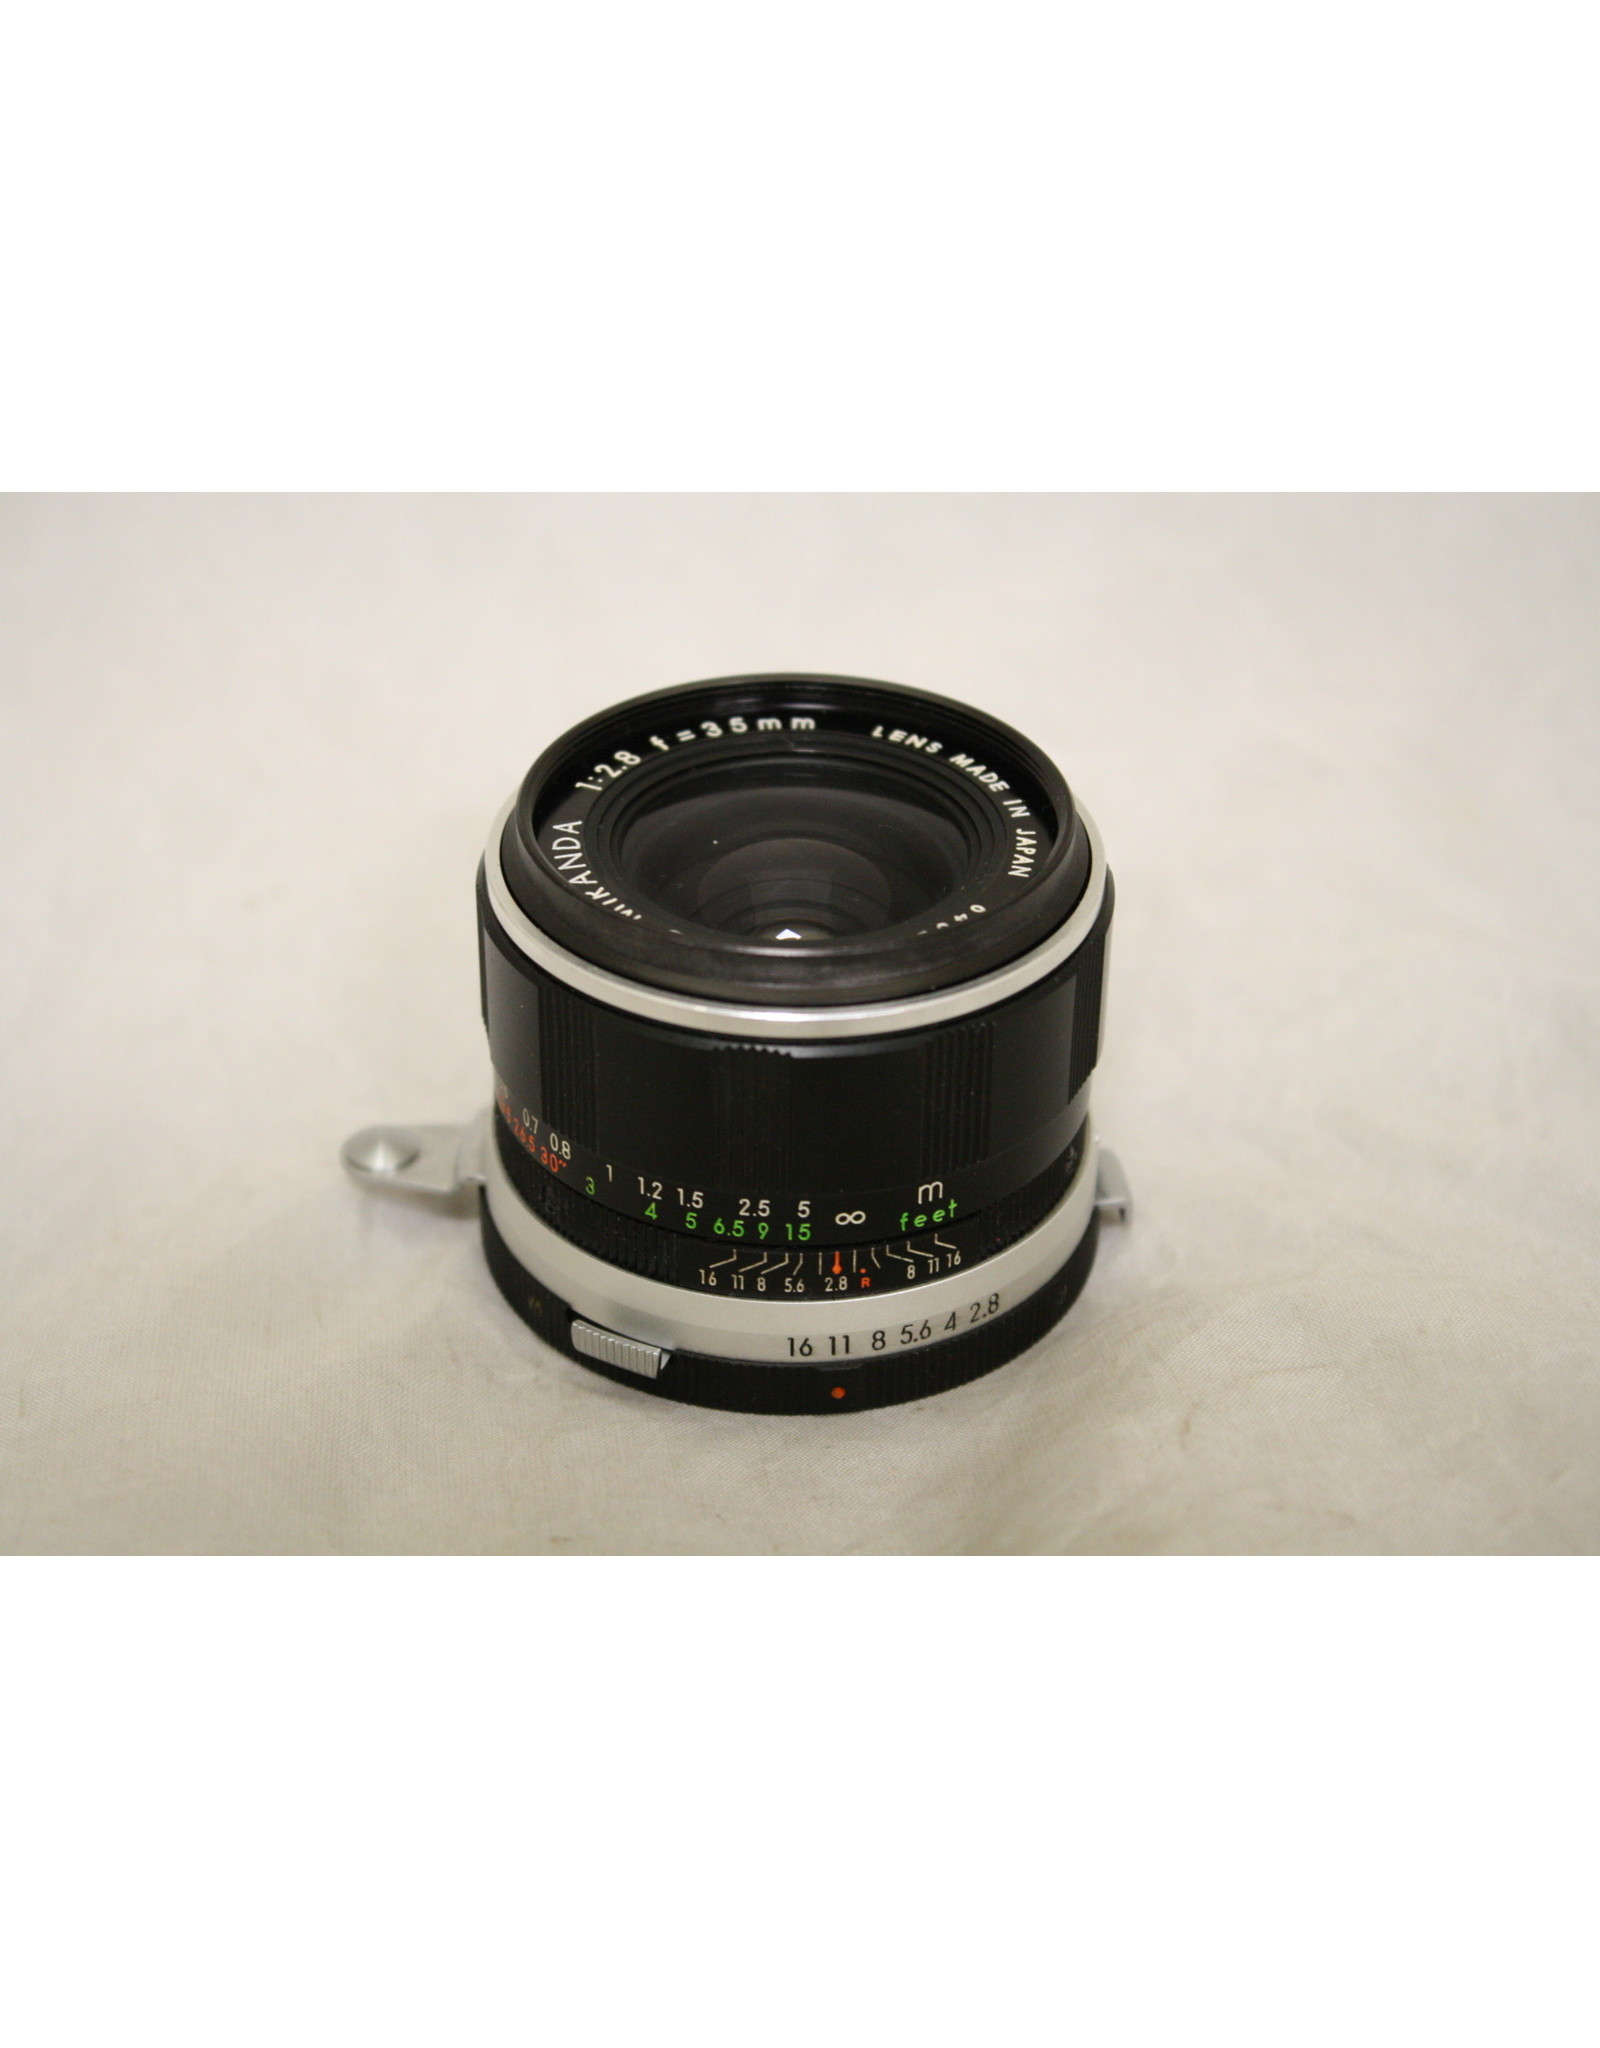 Auto Miranda 35mm 2.8 Film Camera Lens